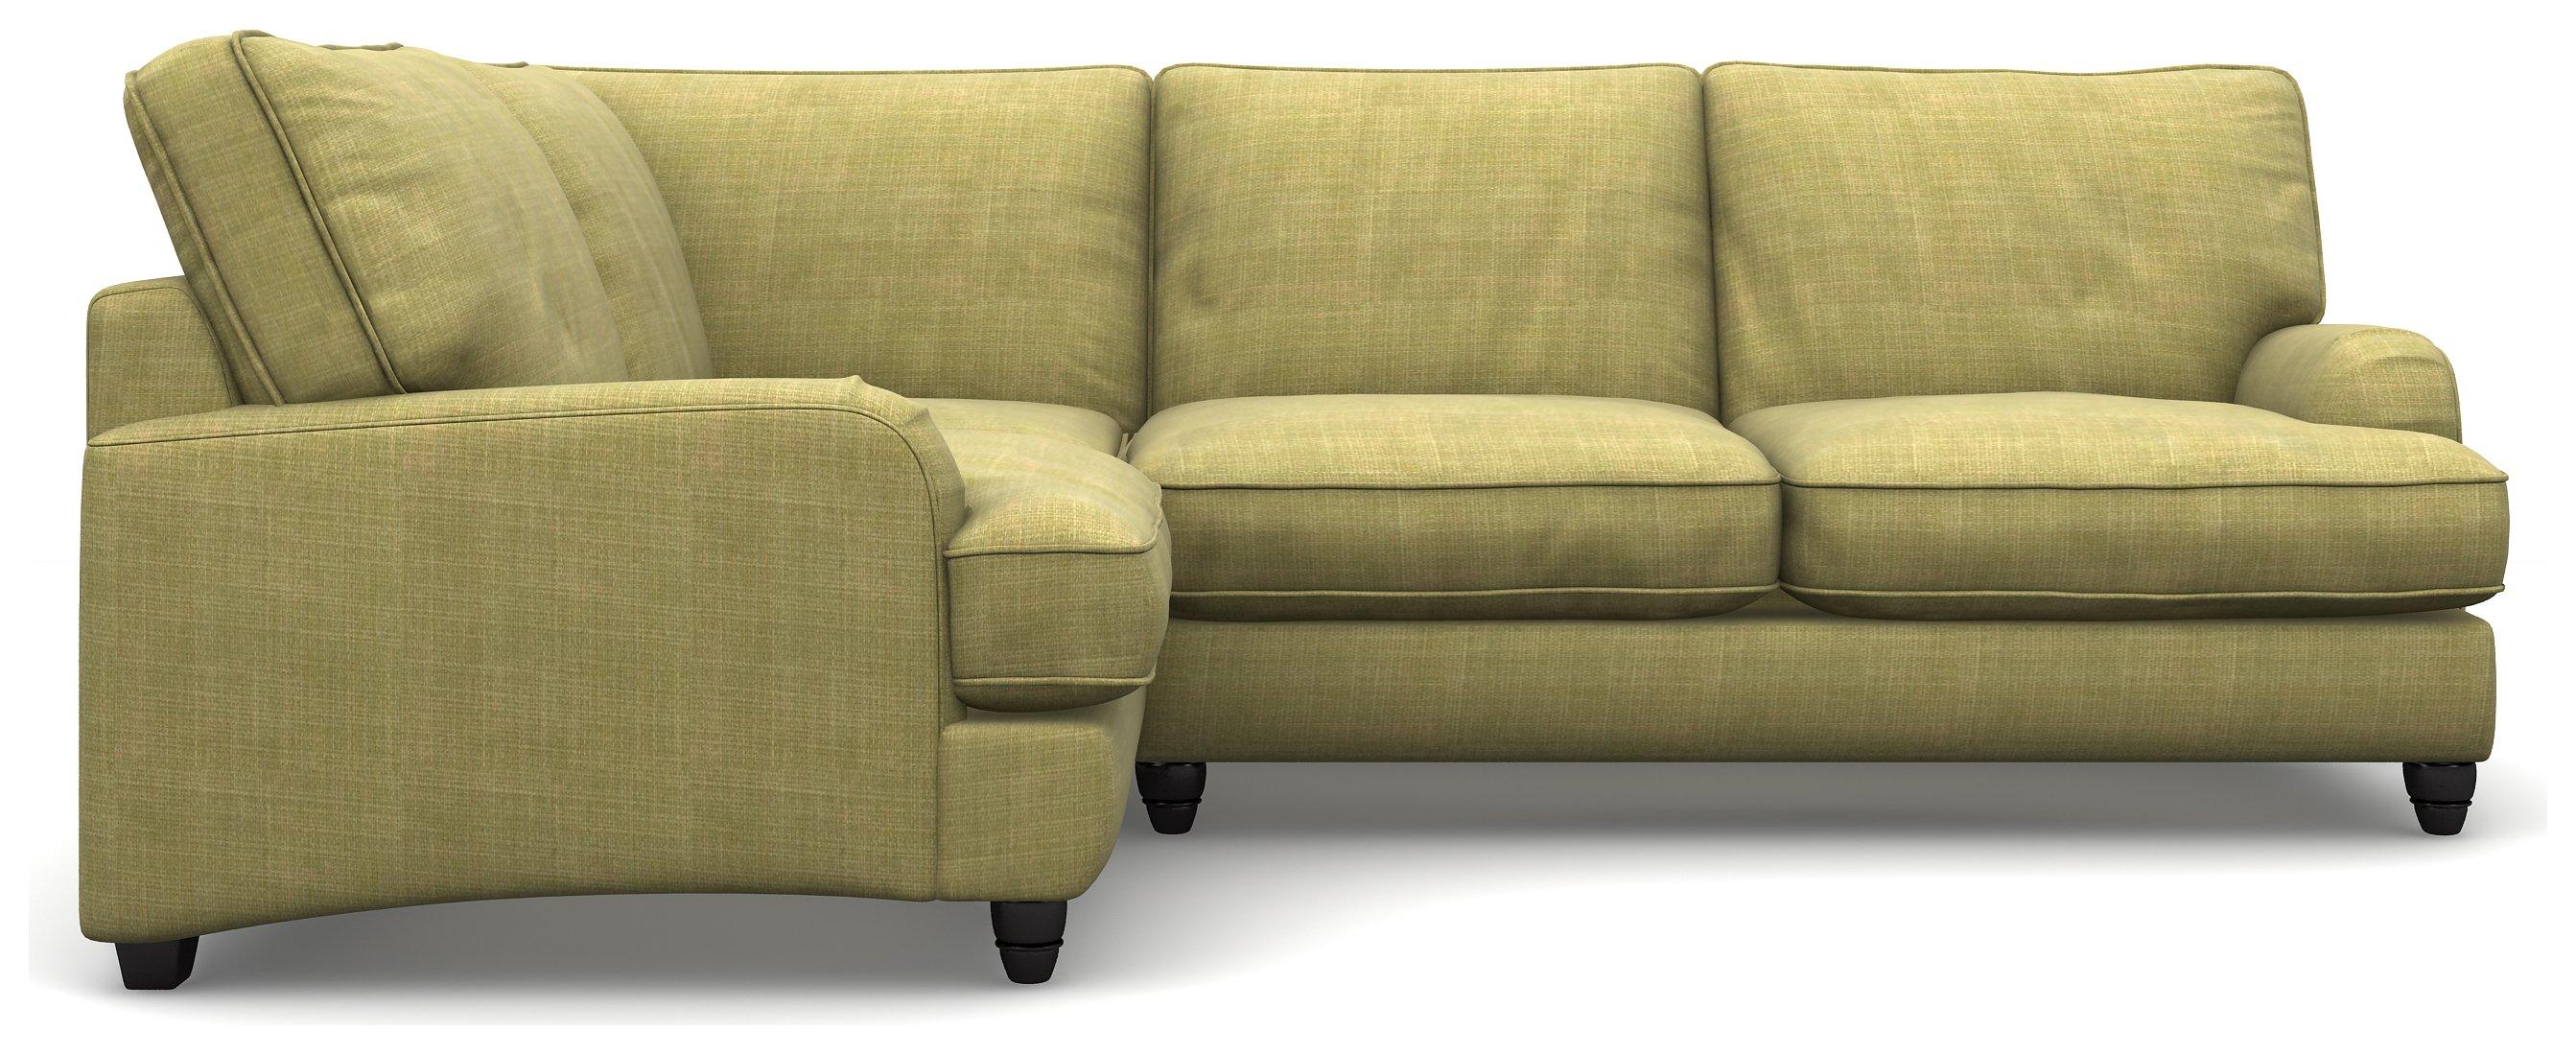 Heart of House Adeline Fabric LH Corner Sofa - Olive